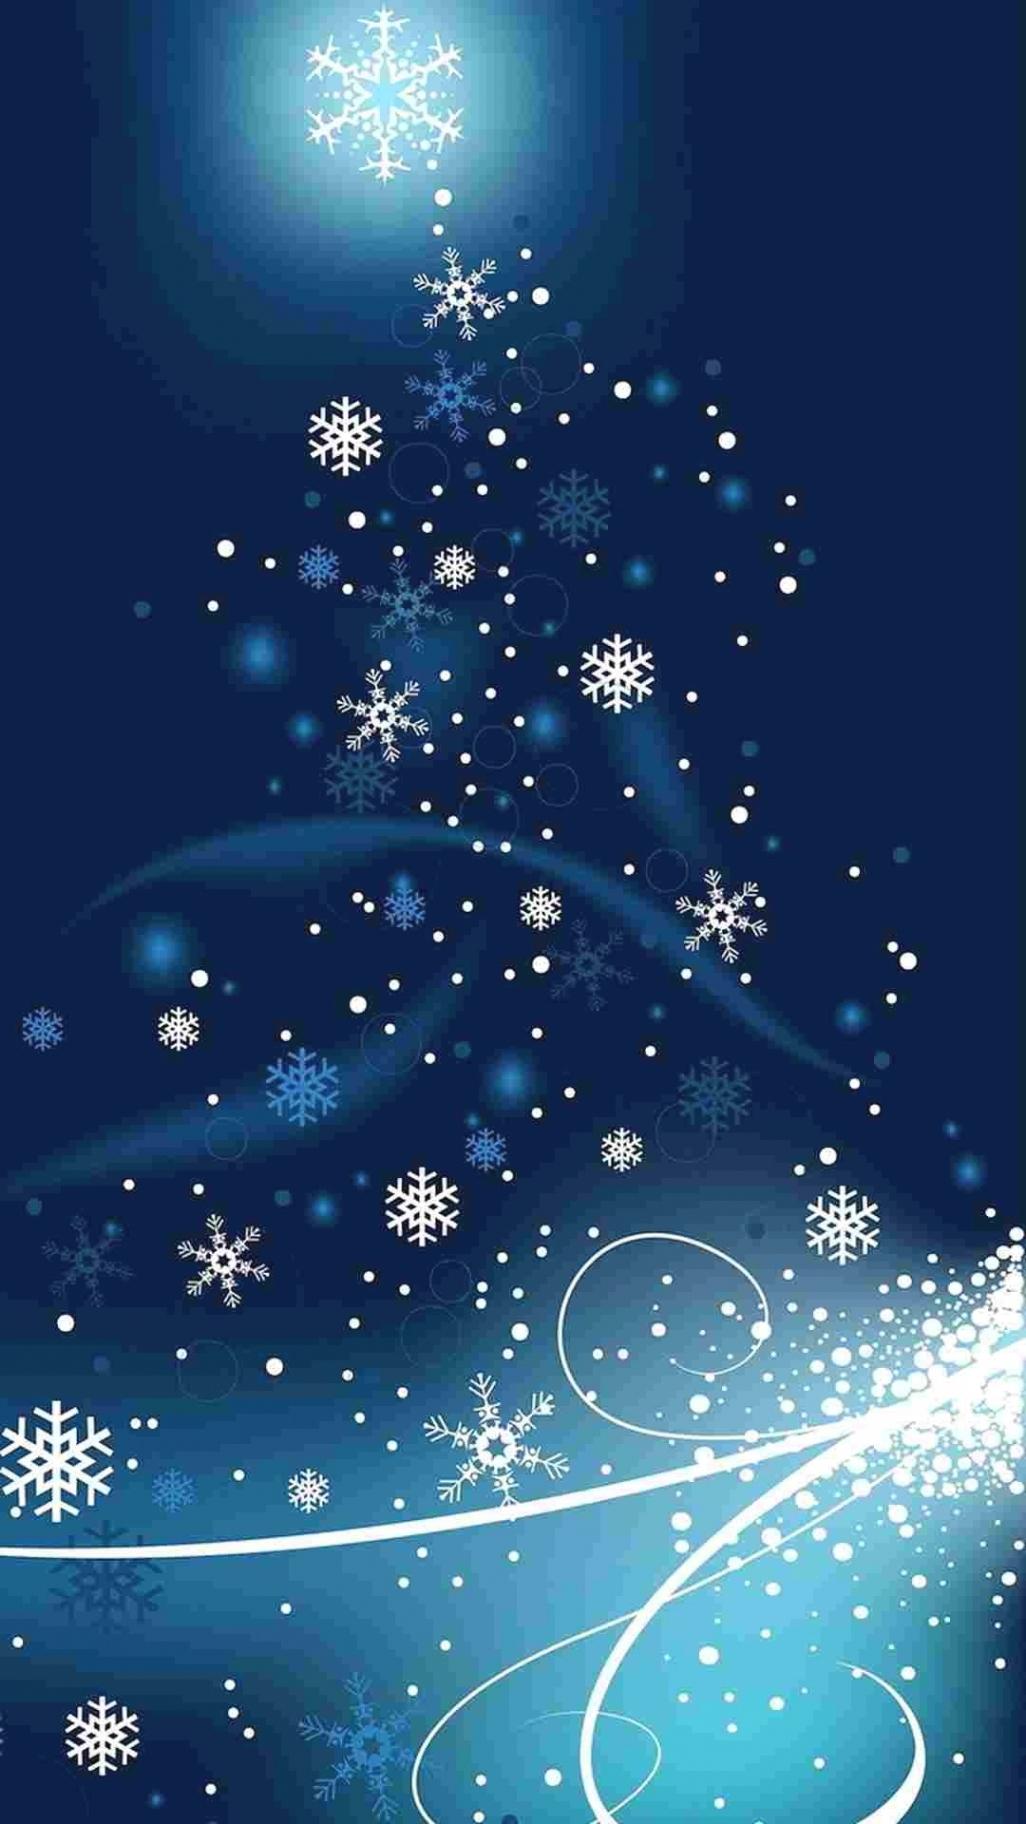 6 Plus Wallpaper - Iphone X Max Wallpaper Christmas , HD Wallpaper & Backgrounds